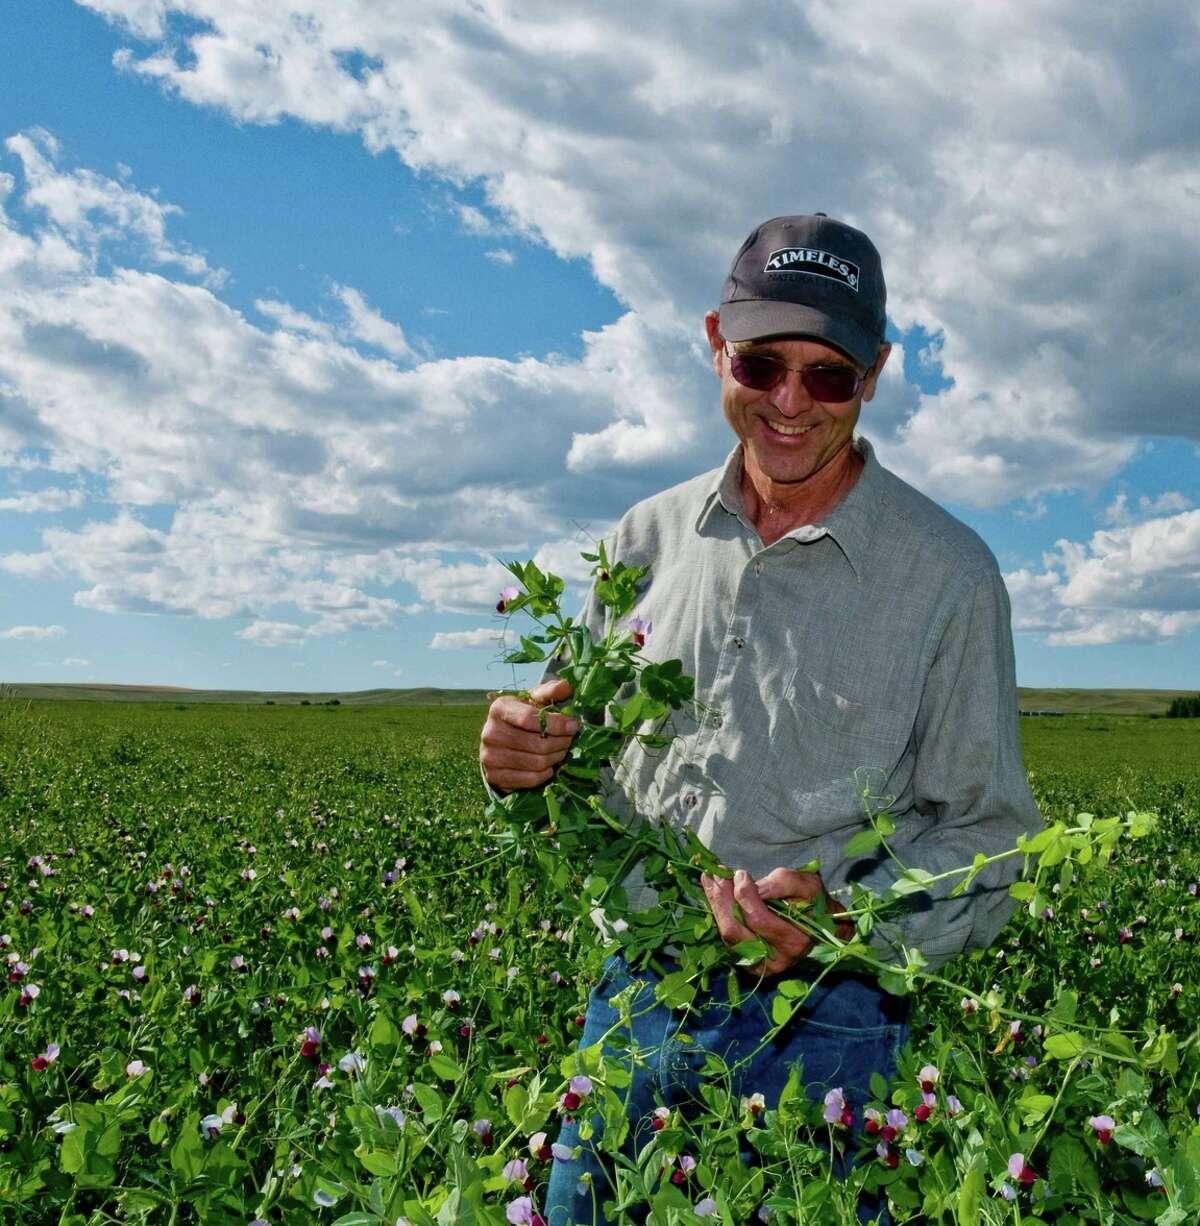 David Oien leads a Montana farm movement based on drought-tolerant lentils.